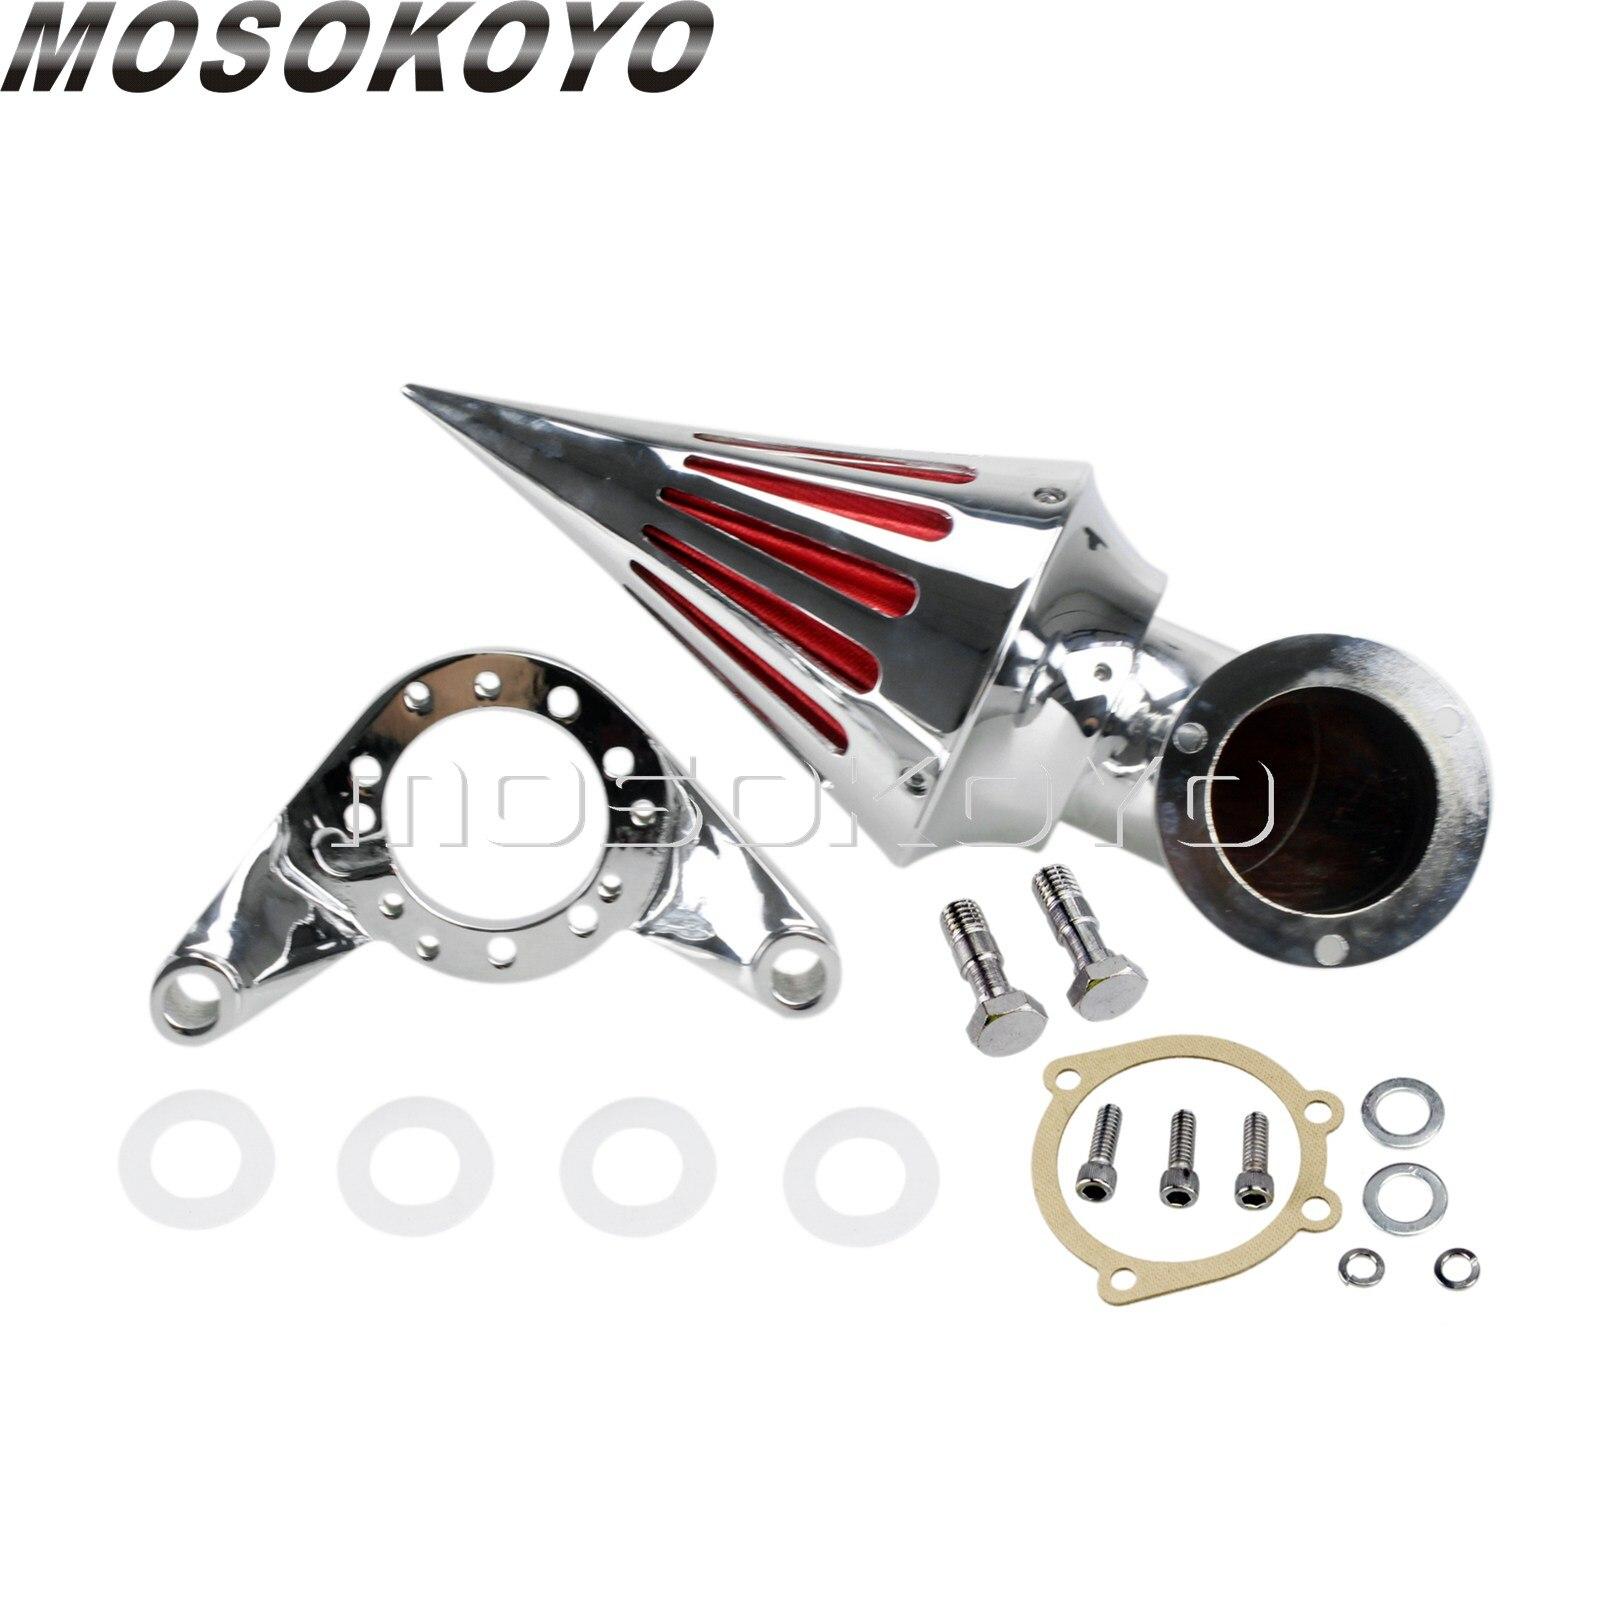 For Harley CV Carburetor Delphi V Twin Motorcycle Spike Air Filter Air Cleaner Intake Kit